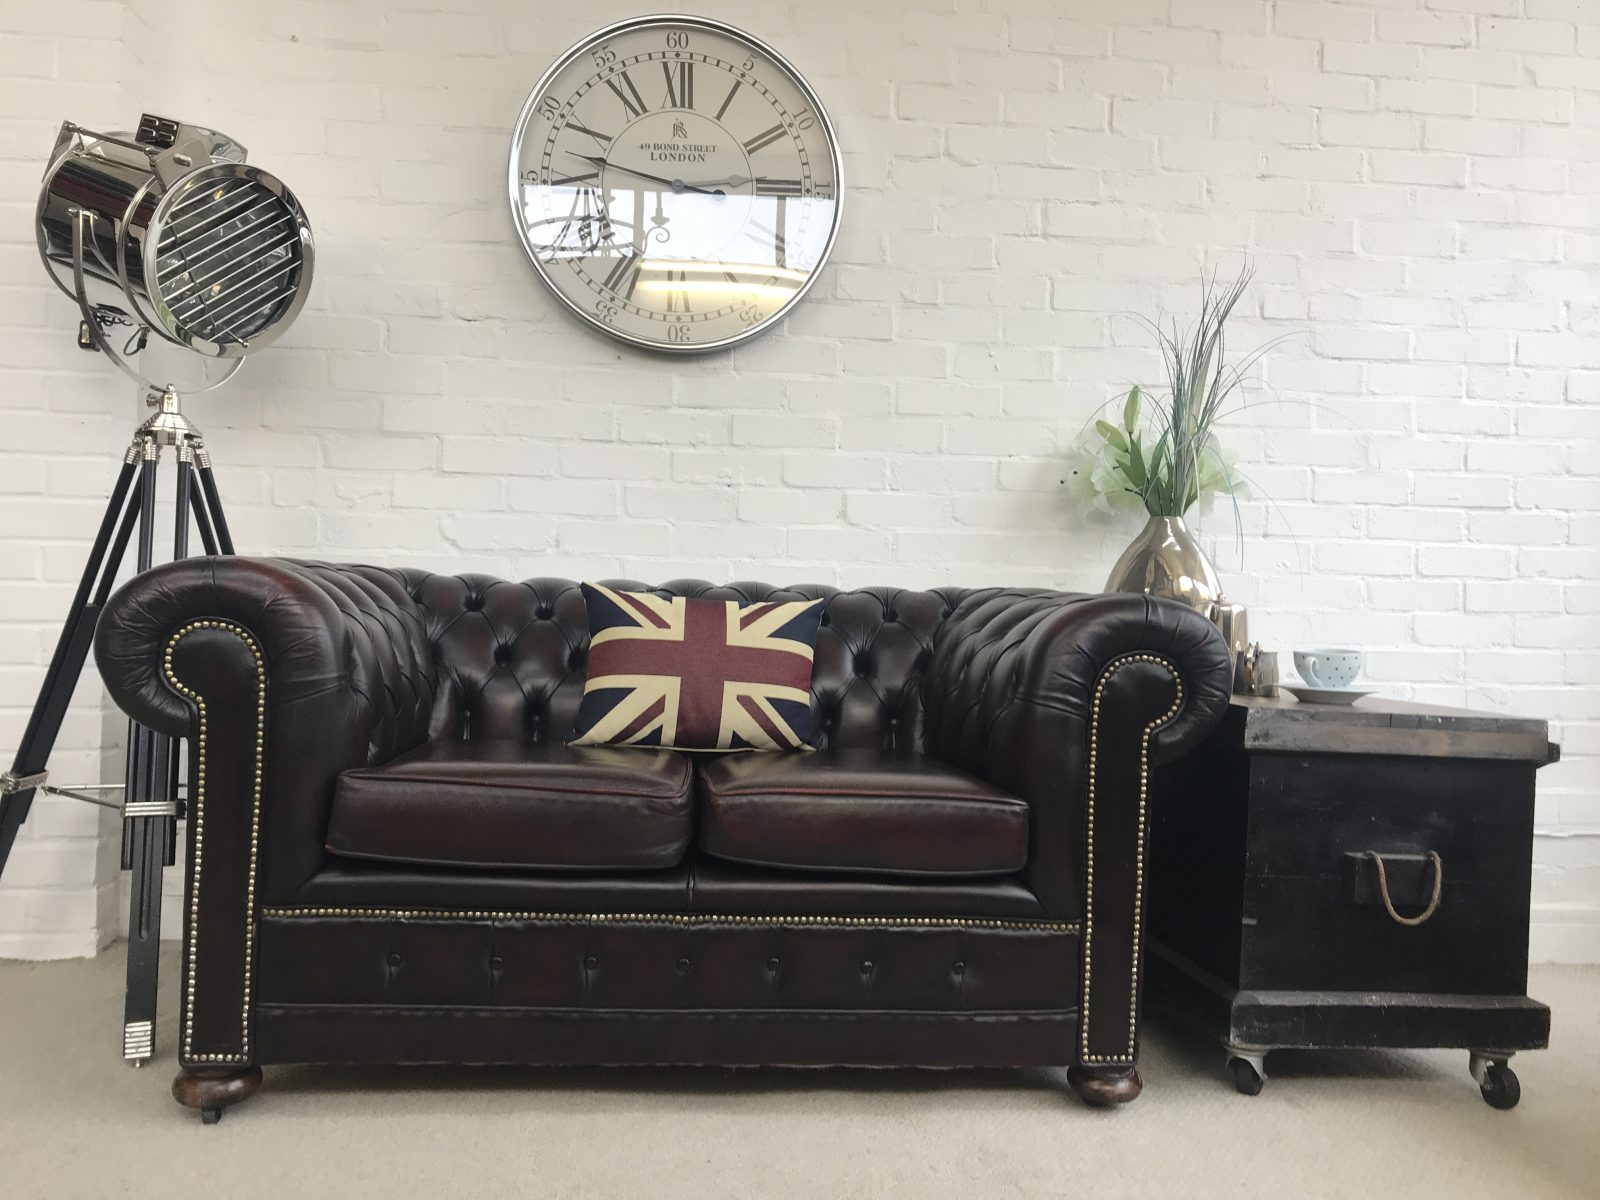 Stunning Vintage Oxblood Chesterfield Sofa.